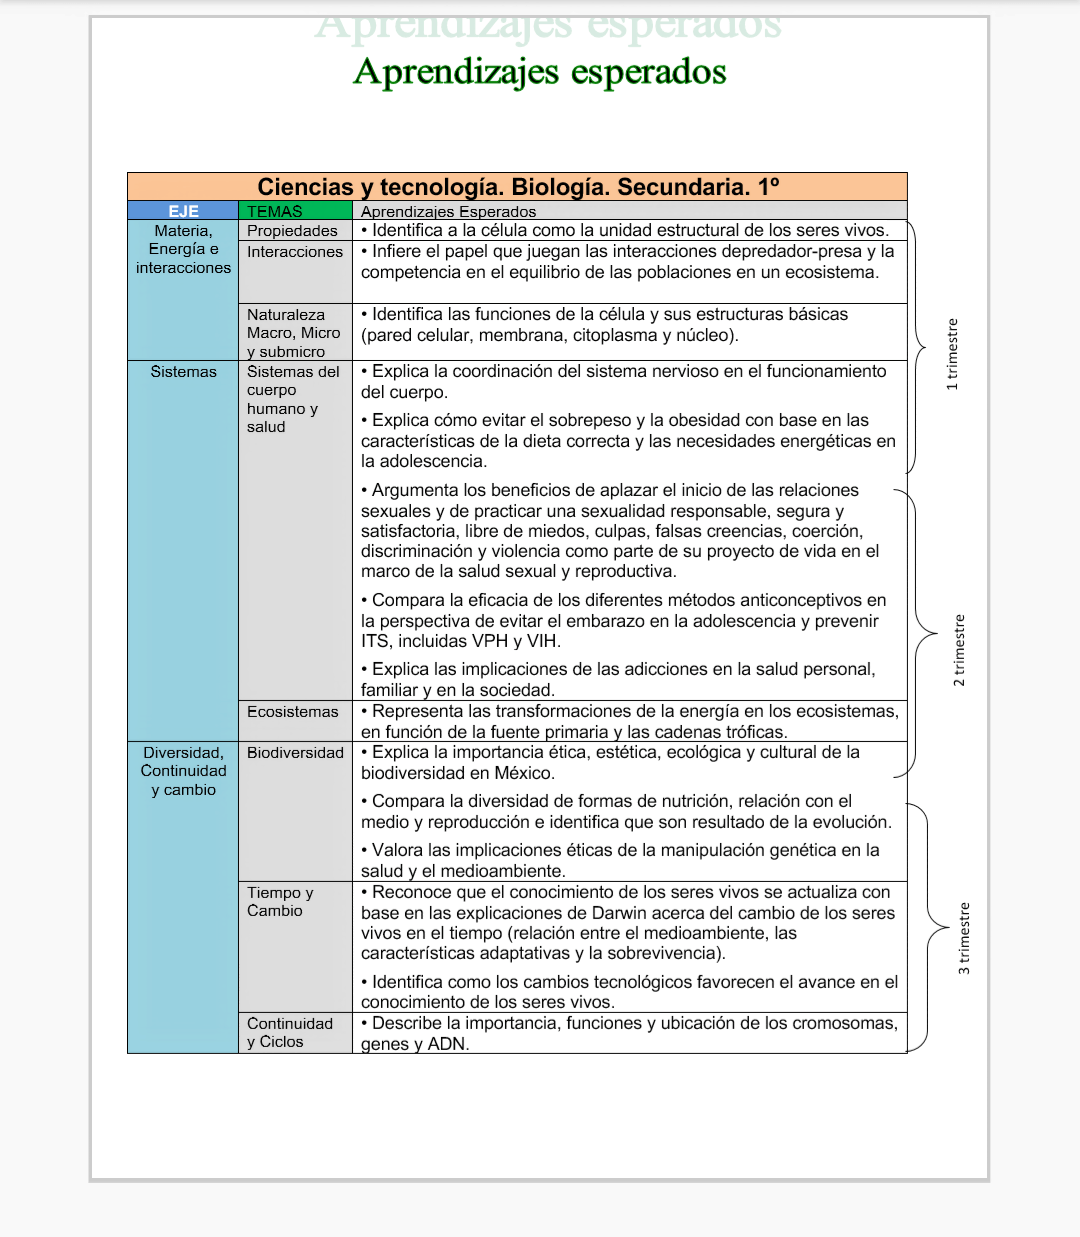 Planeaciones Biologia Secundaria Nuevo Modelo Educativo 1er Trimestre